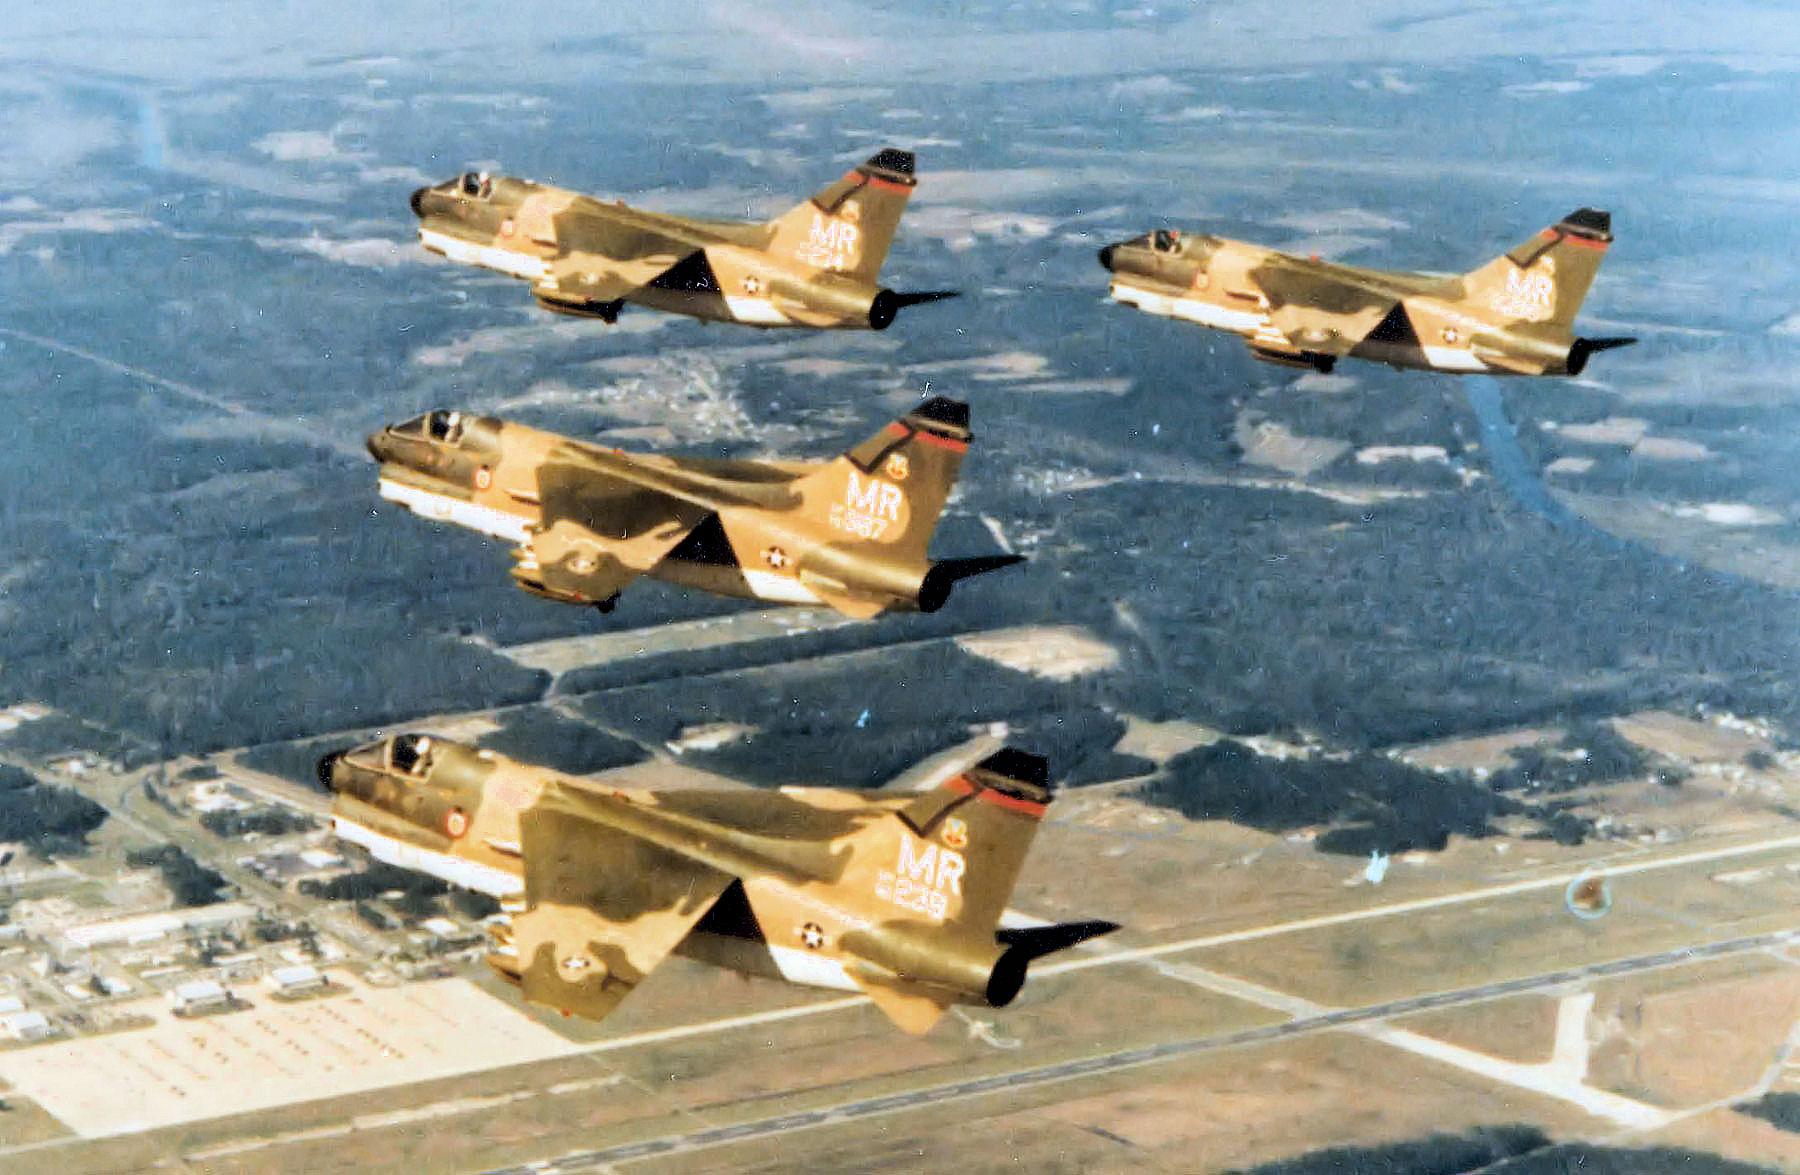 Myrtle Beach Air Force Base Location